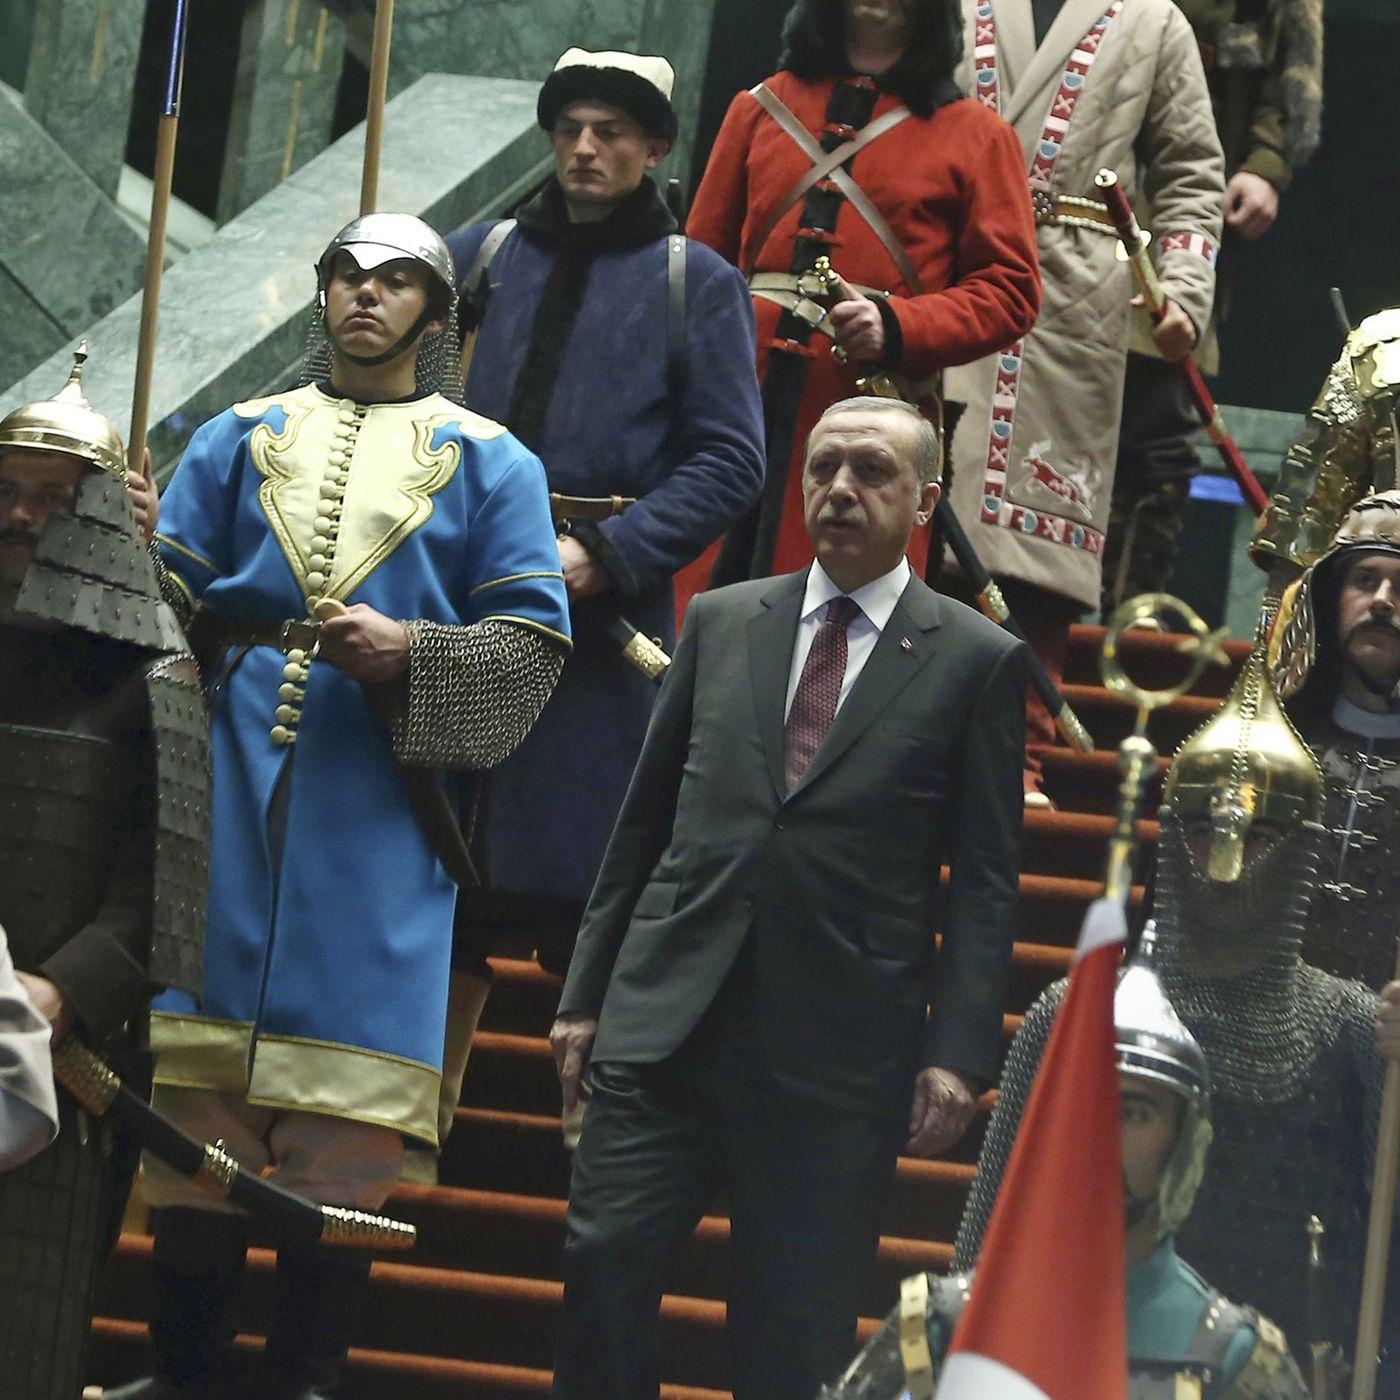 Watch: the weird German music video that infuriated Turkey's